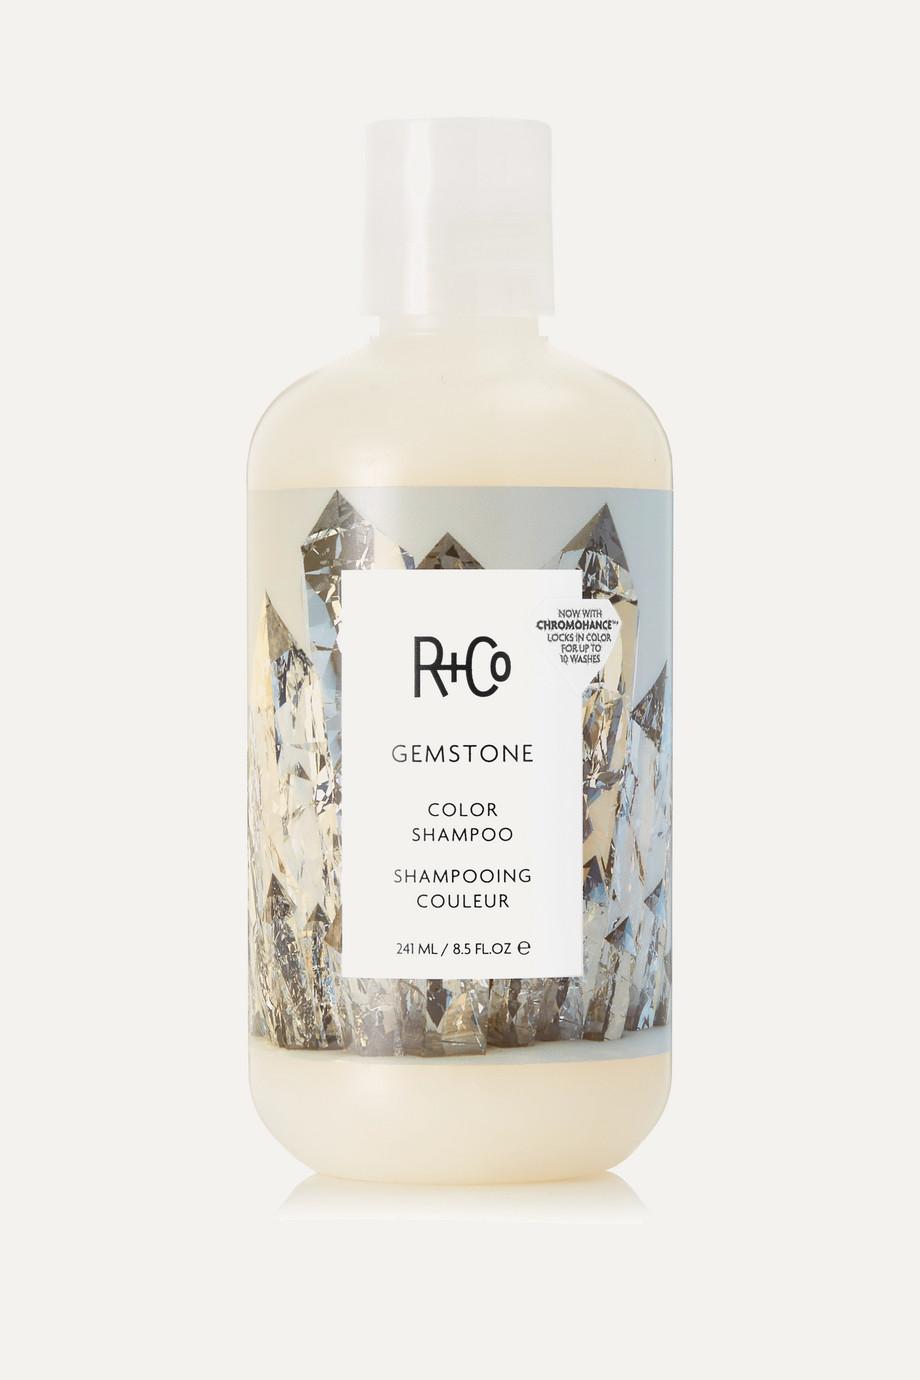 R+Co Gemstone Color Shampoo, 241 ml – Shampoo